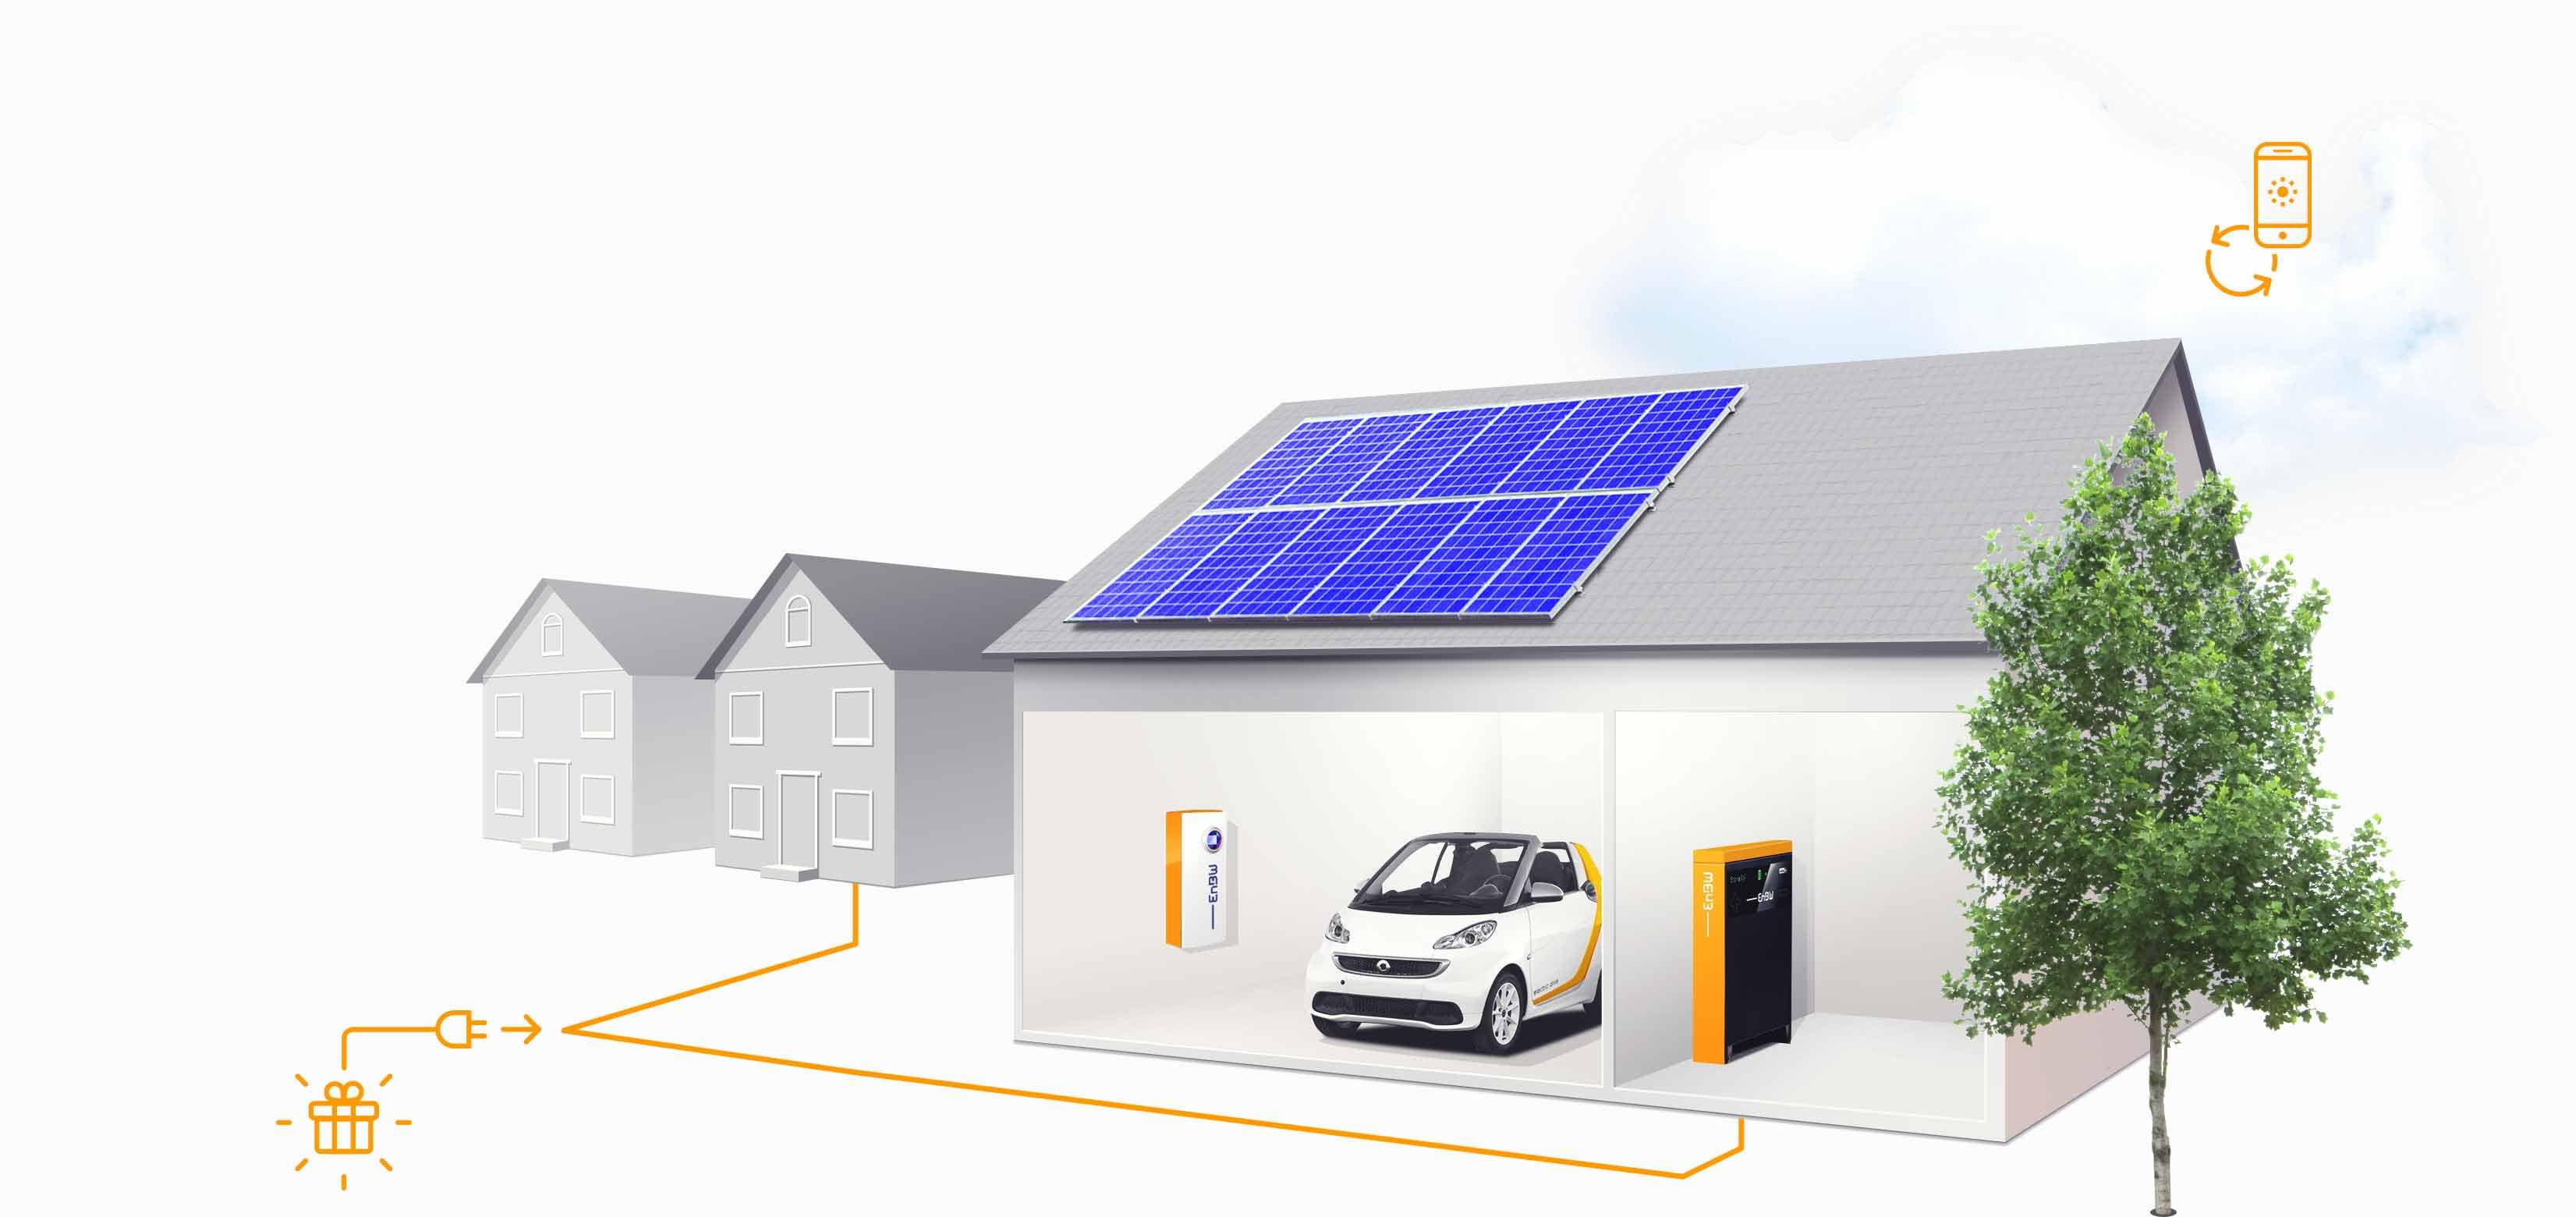 solar strom selbst erzeugen speichern teilen enbw solar enbw. Black Bedroom Furniture Sets. Home Design Ideas